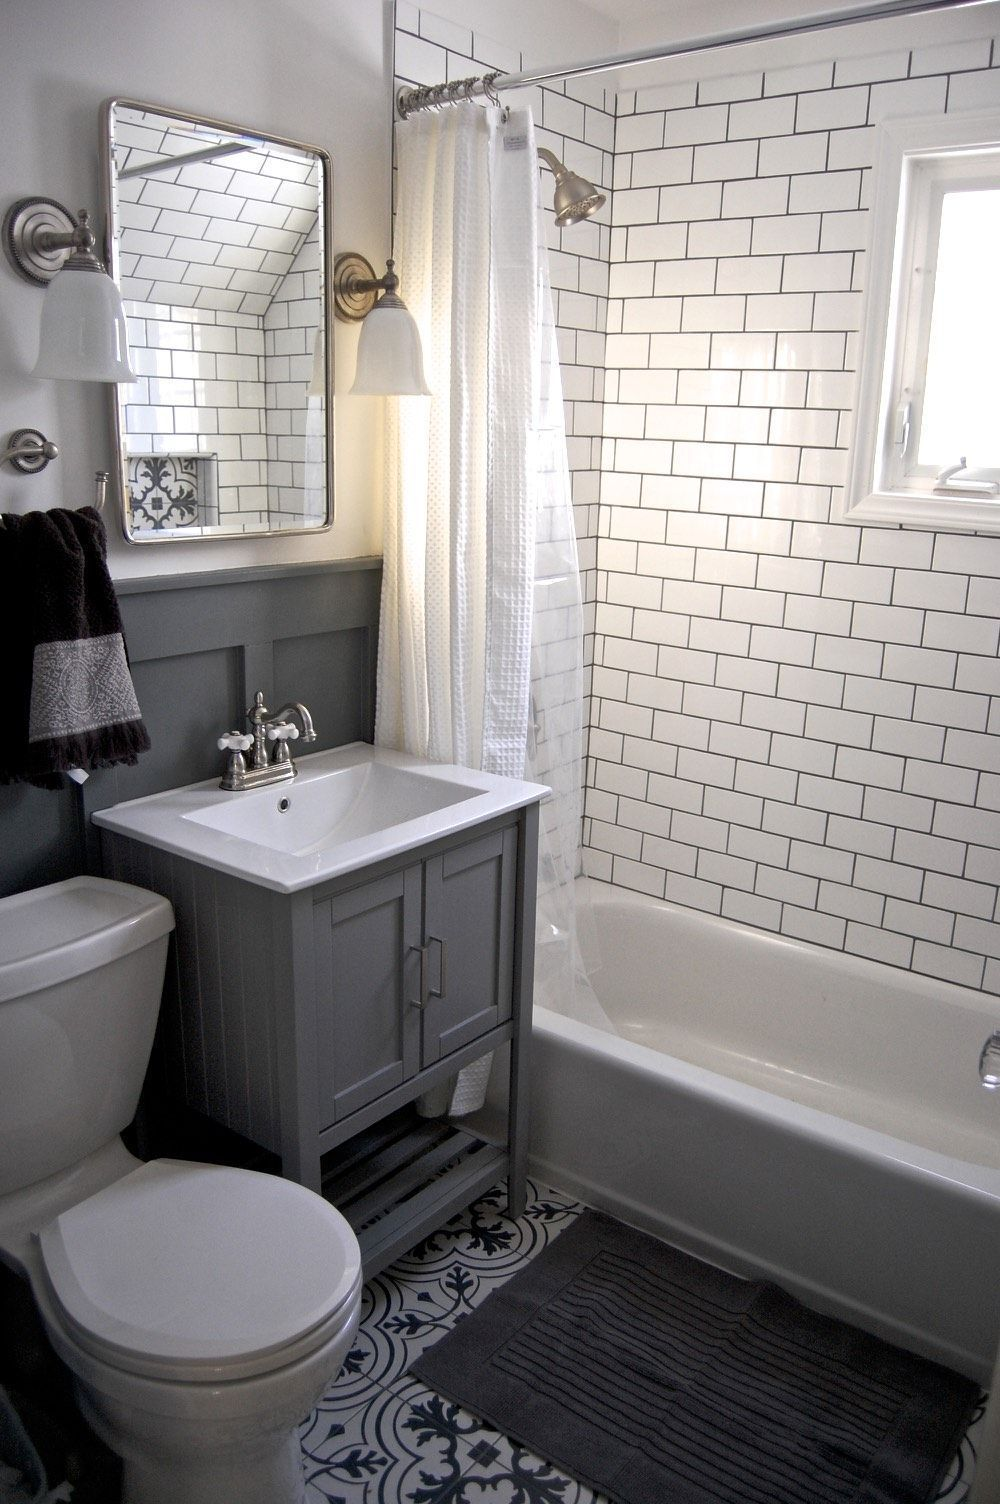 40 Best Bathroom Renovation Ideas Bathroom Diybathroomrenovationideas Ideas Renovation In 2020 Gray And White Bathroom Small Bathroom Small Bathroom Inspiration